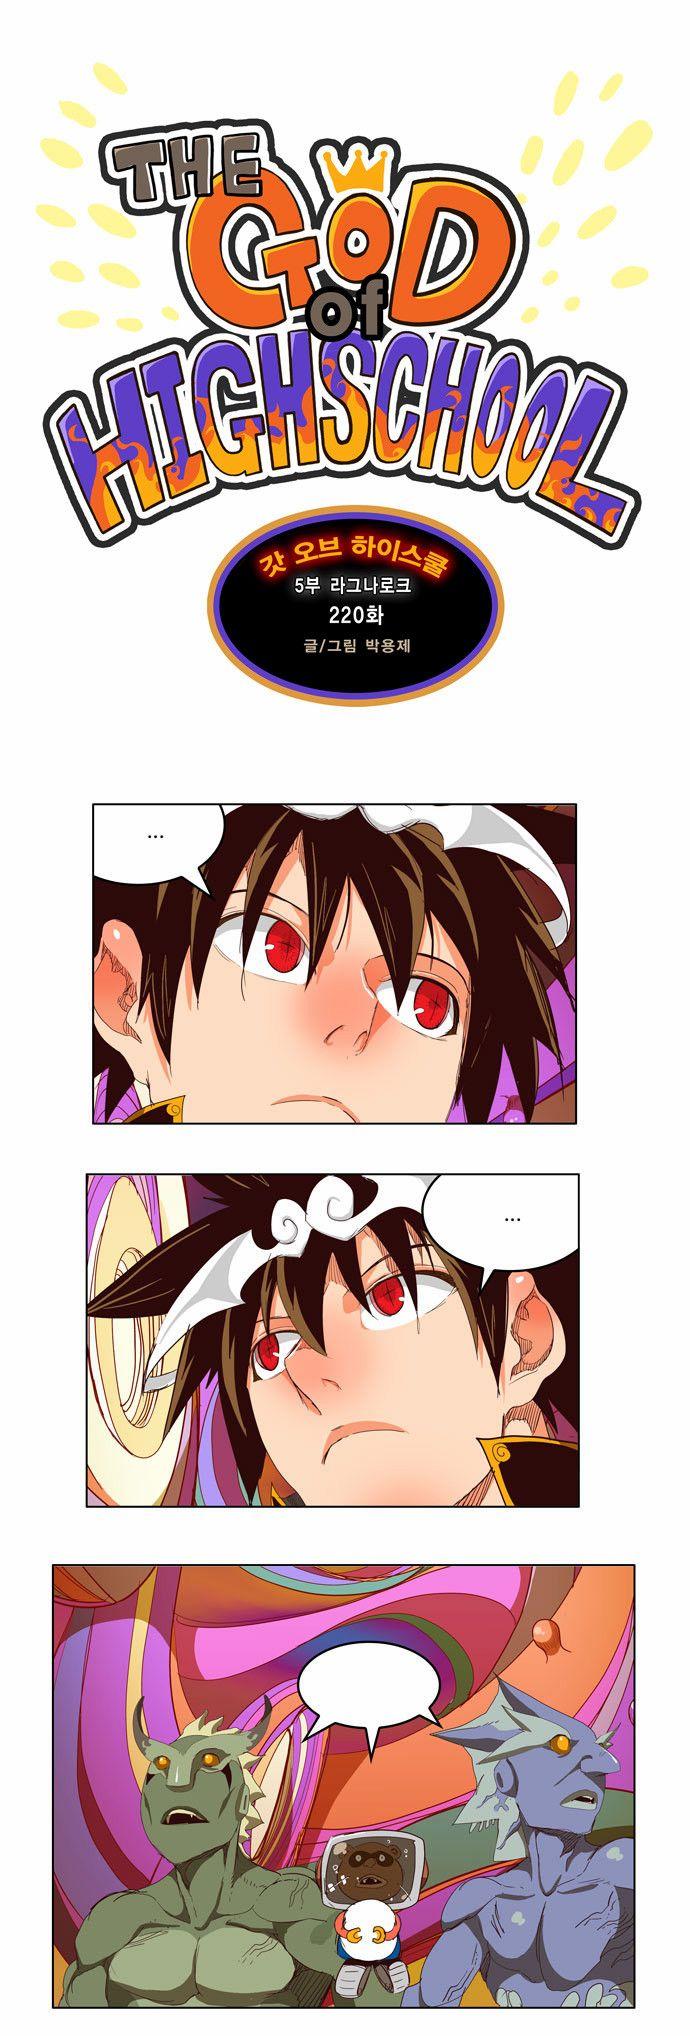 http://c5.ninemanga.com/es_manga/37/485/454639/3fd35dfcc8e0ce7cca31532a92d6701c.jpg Page 3